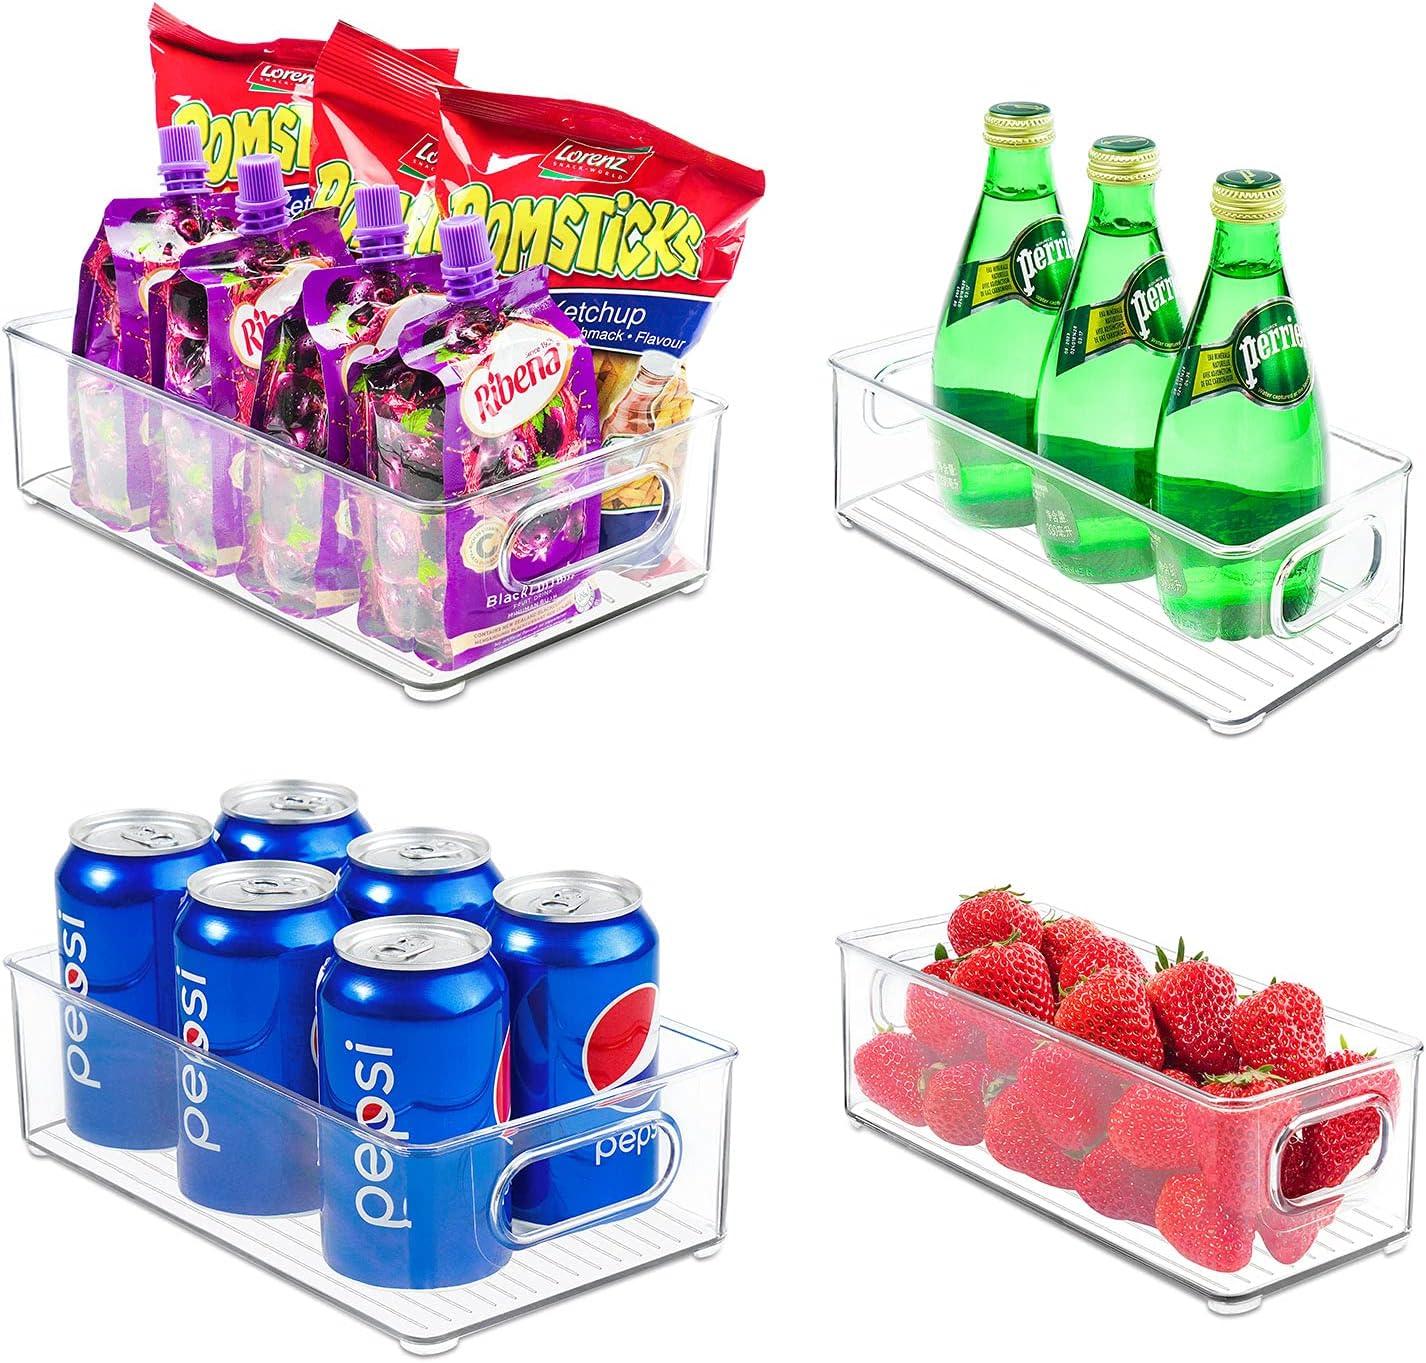 Refrigerator Organizer Bins, MEFASO Set of 4 Plastic Food Storage Bins(2 Large & 2 Small Drawers) with Handle for Fridge,Freezer,Kitchen,Garage, Cabinets,Pantry, BPA-Free